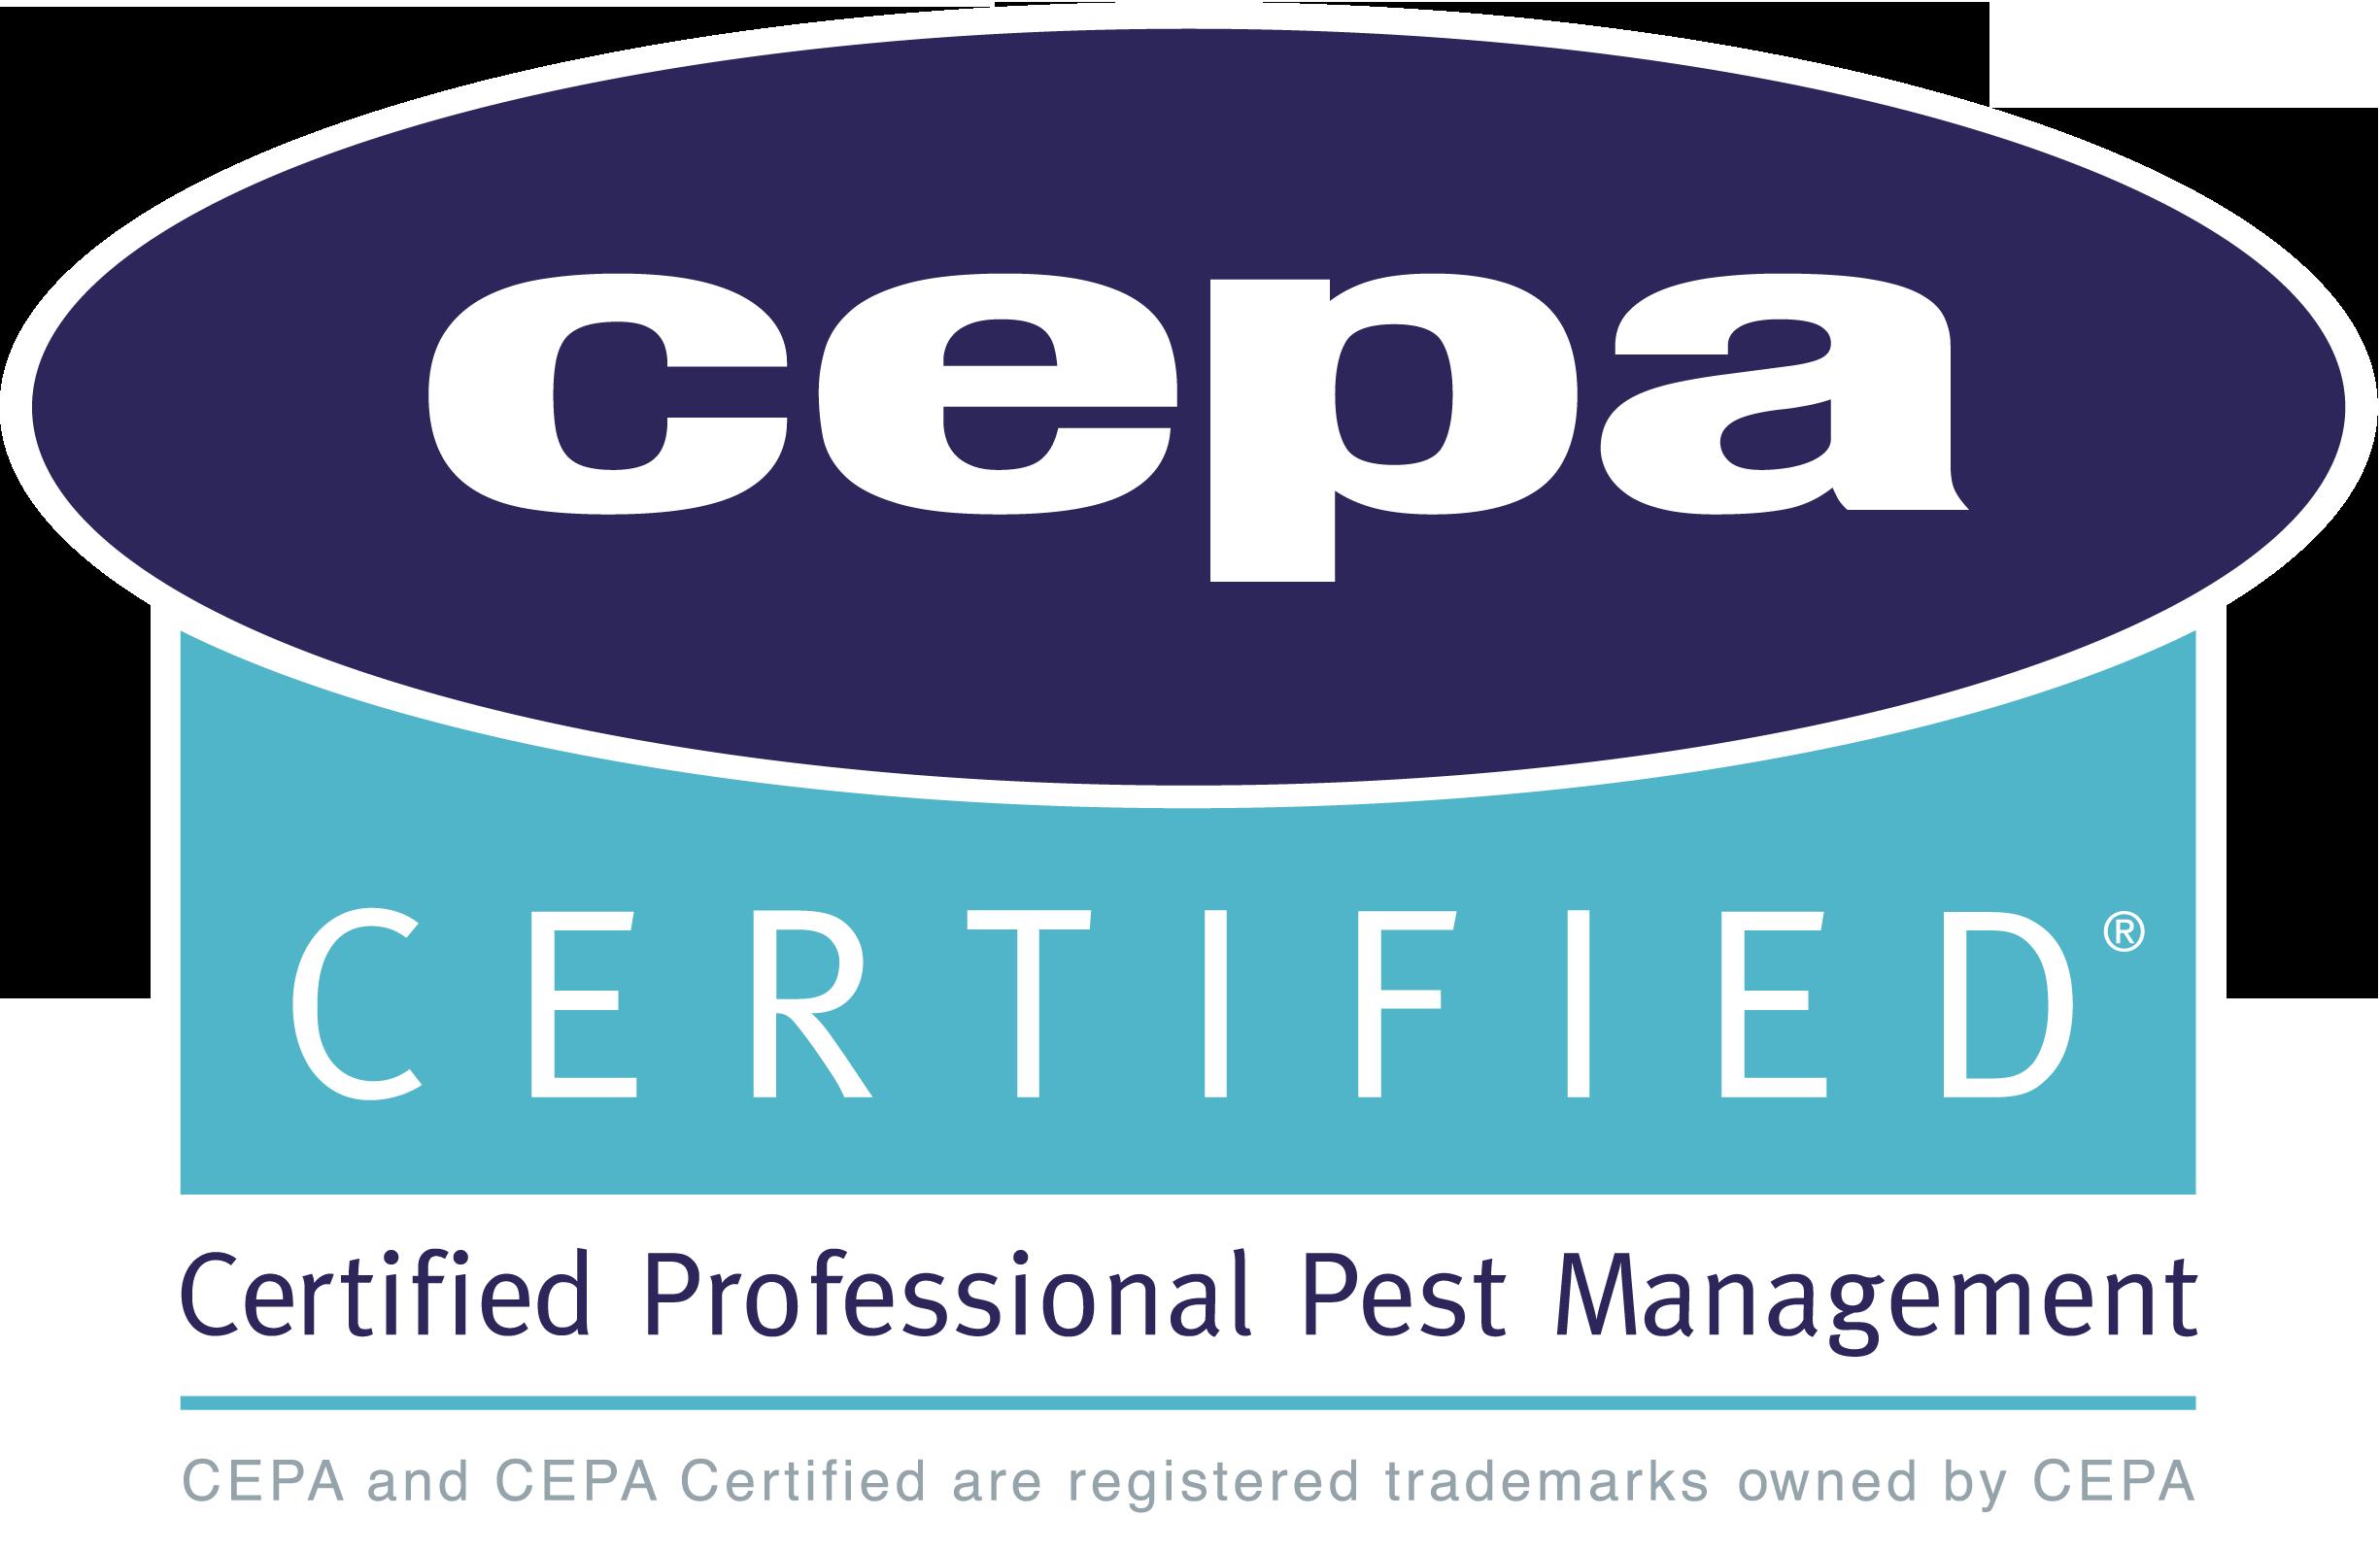 CEPA-Certified-logo-RGB